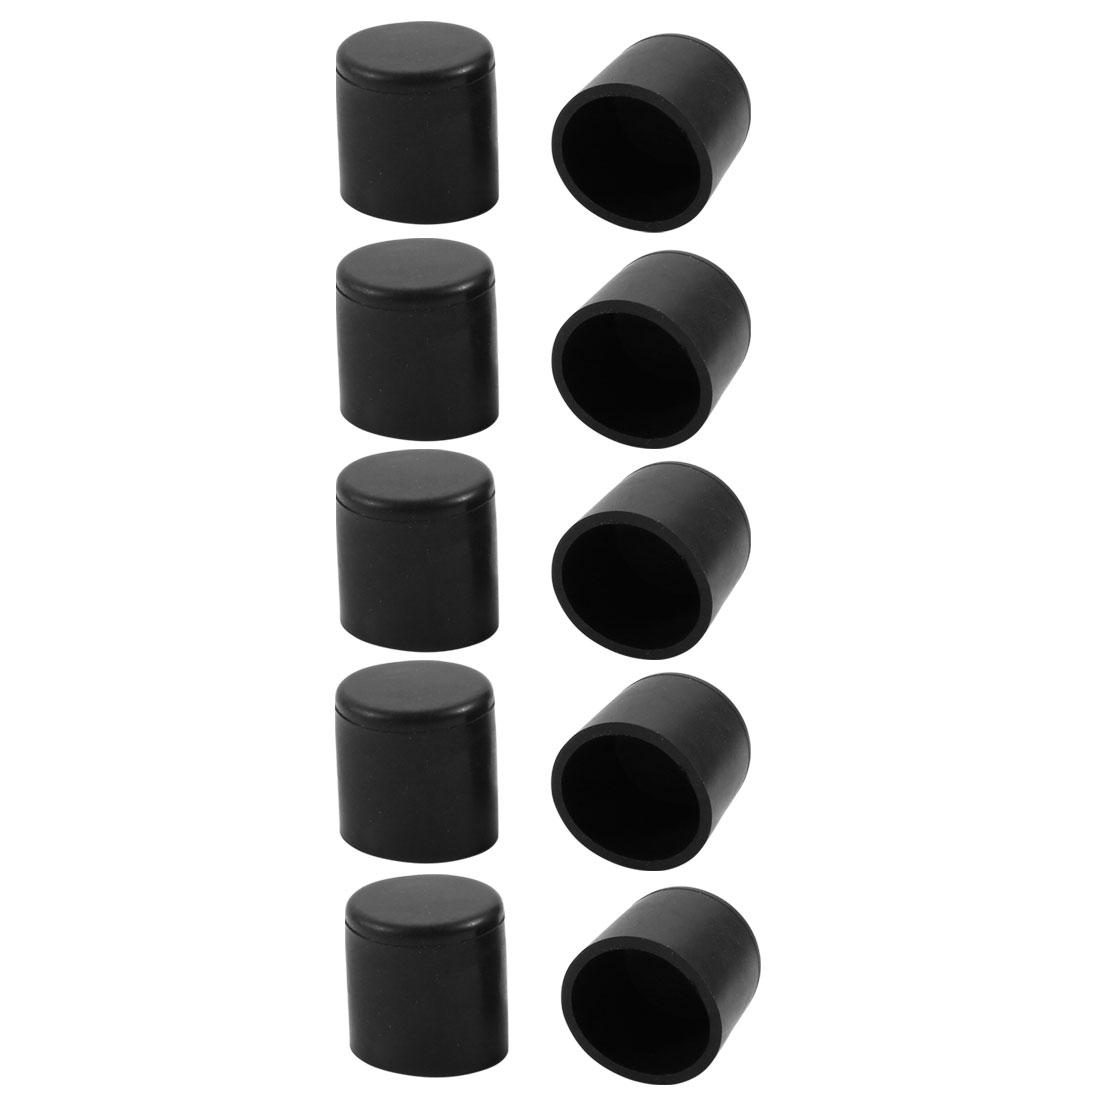 10pcs 19mm Dia Black PVC Rubber Round Cabinet Leg Insert Cover Protector